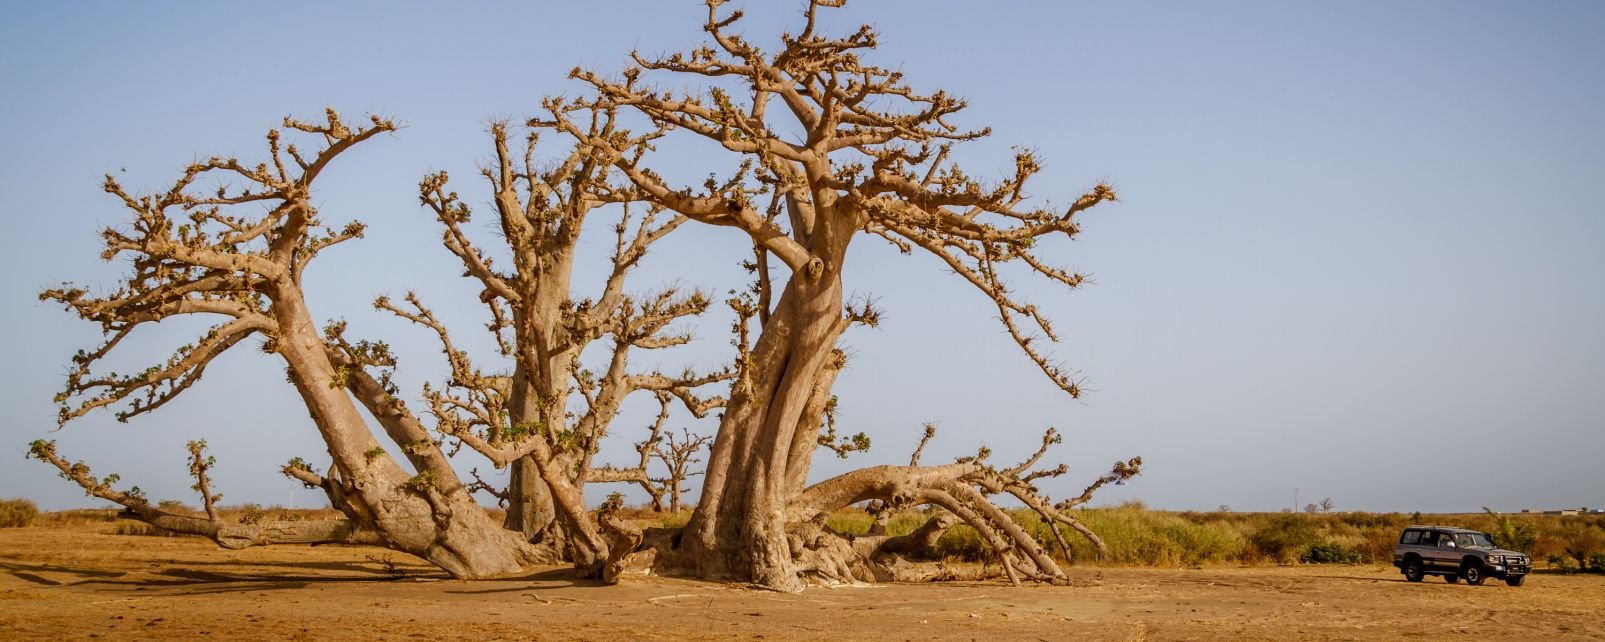 Die Ferlo-Wüste, Die Wüste Ferlo, Die Landschaften, Senegal